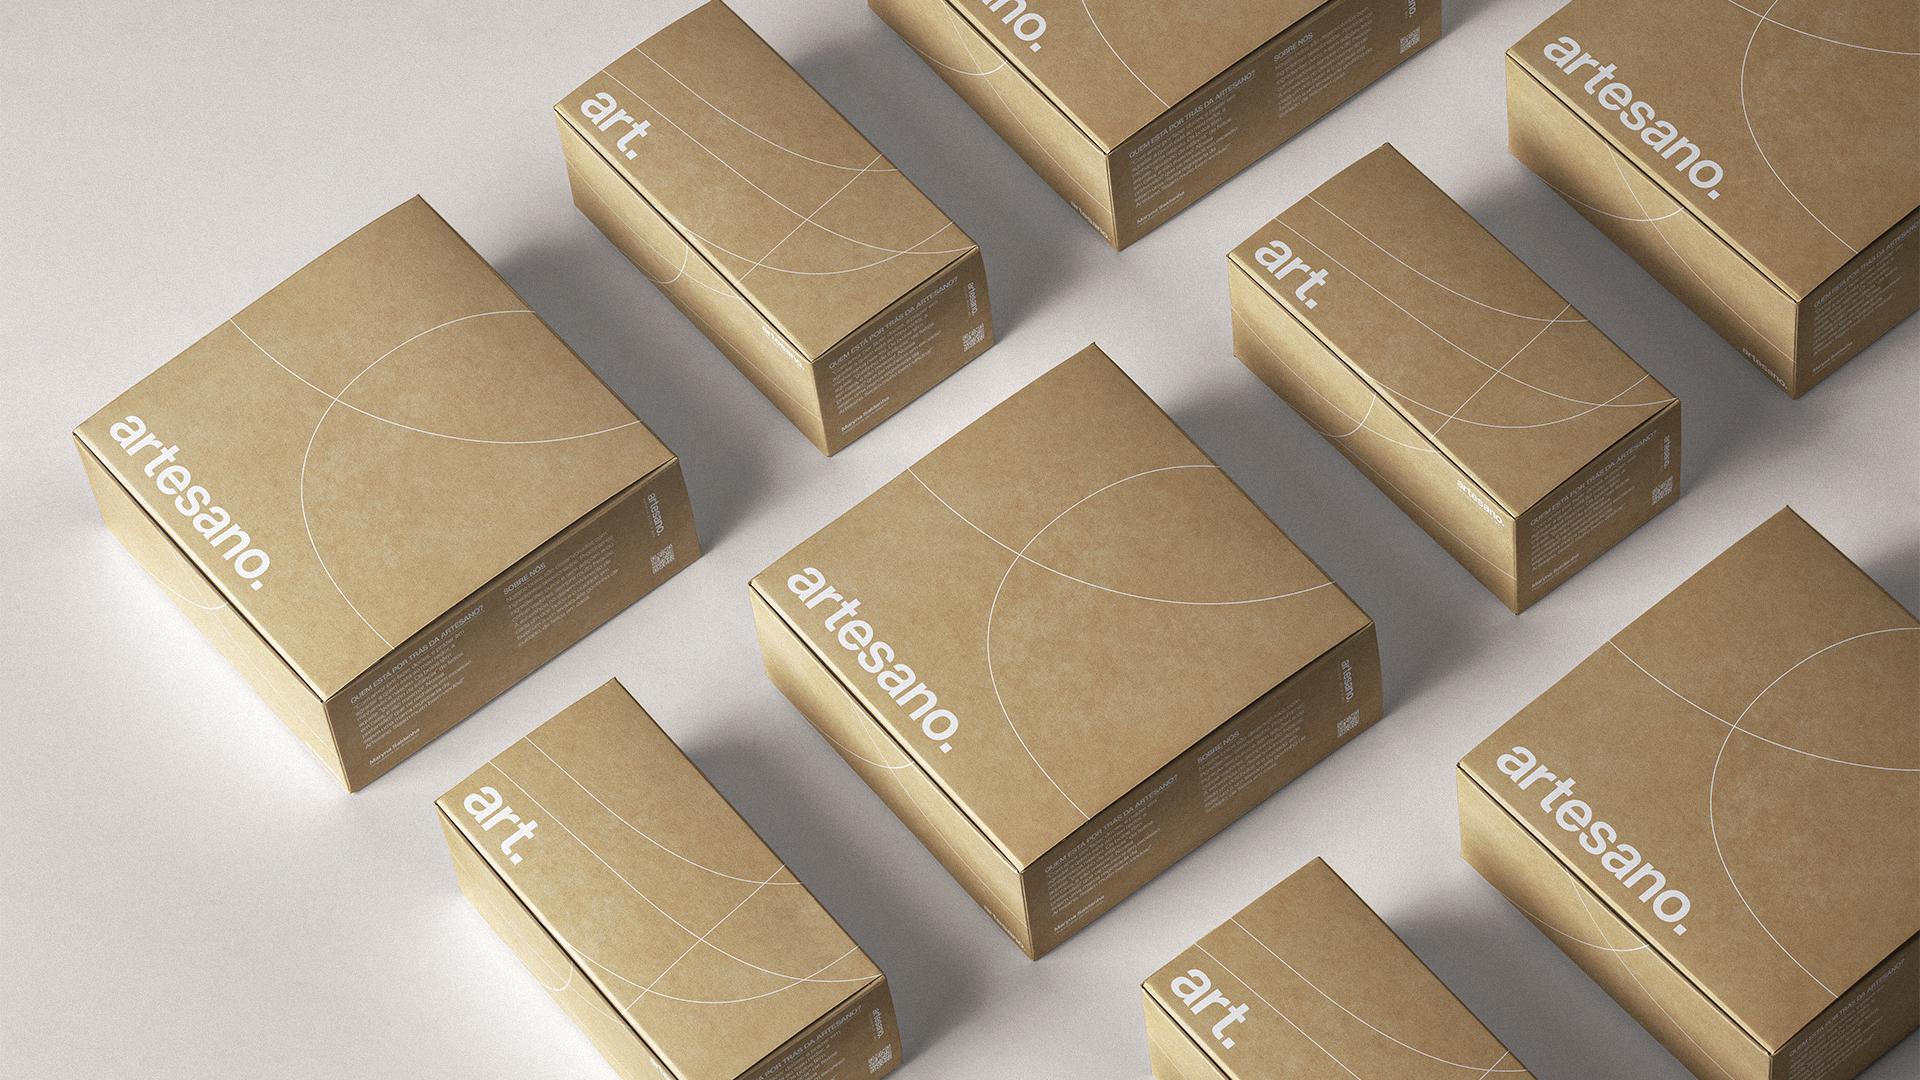 Artesano Rebrand and Packaging Design Designed by Miguel Vaz